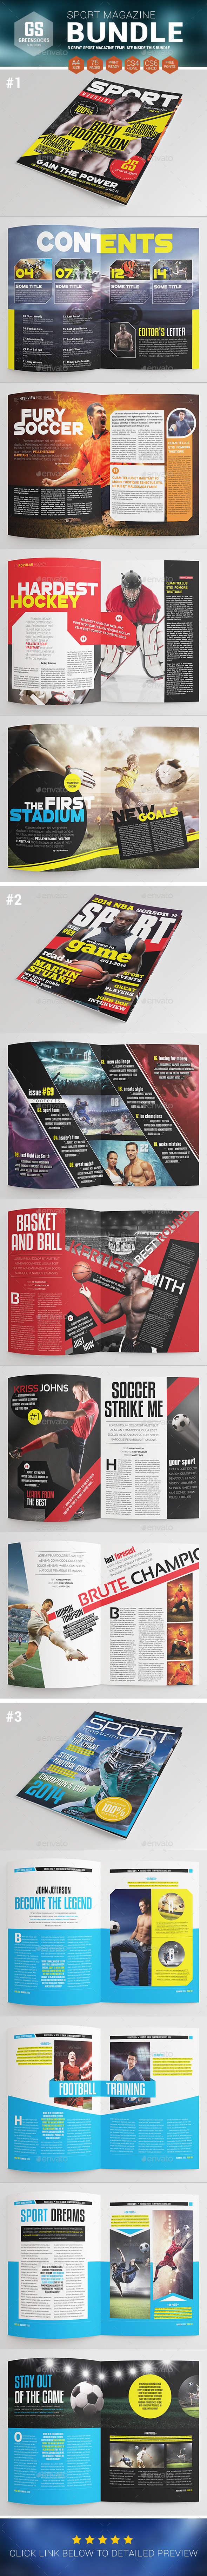 Sport Magazine Bundle - Magazines Print Templates